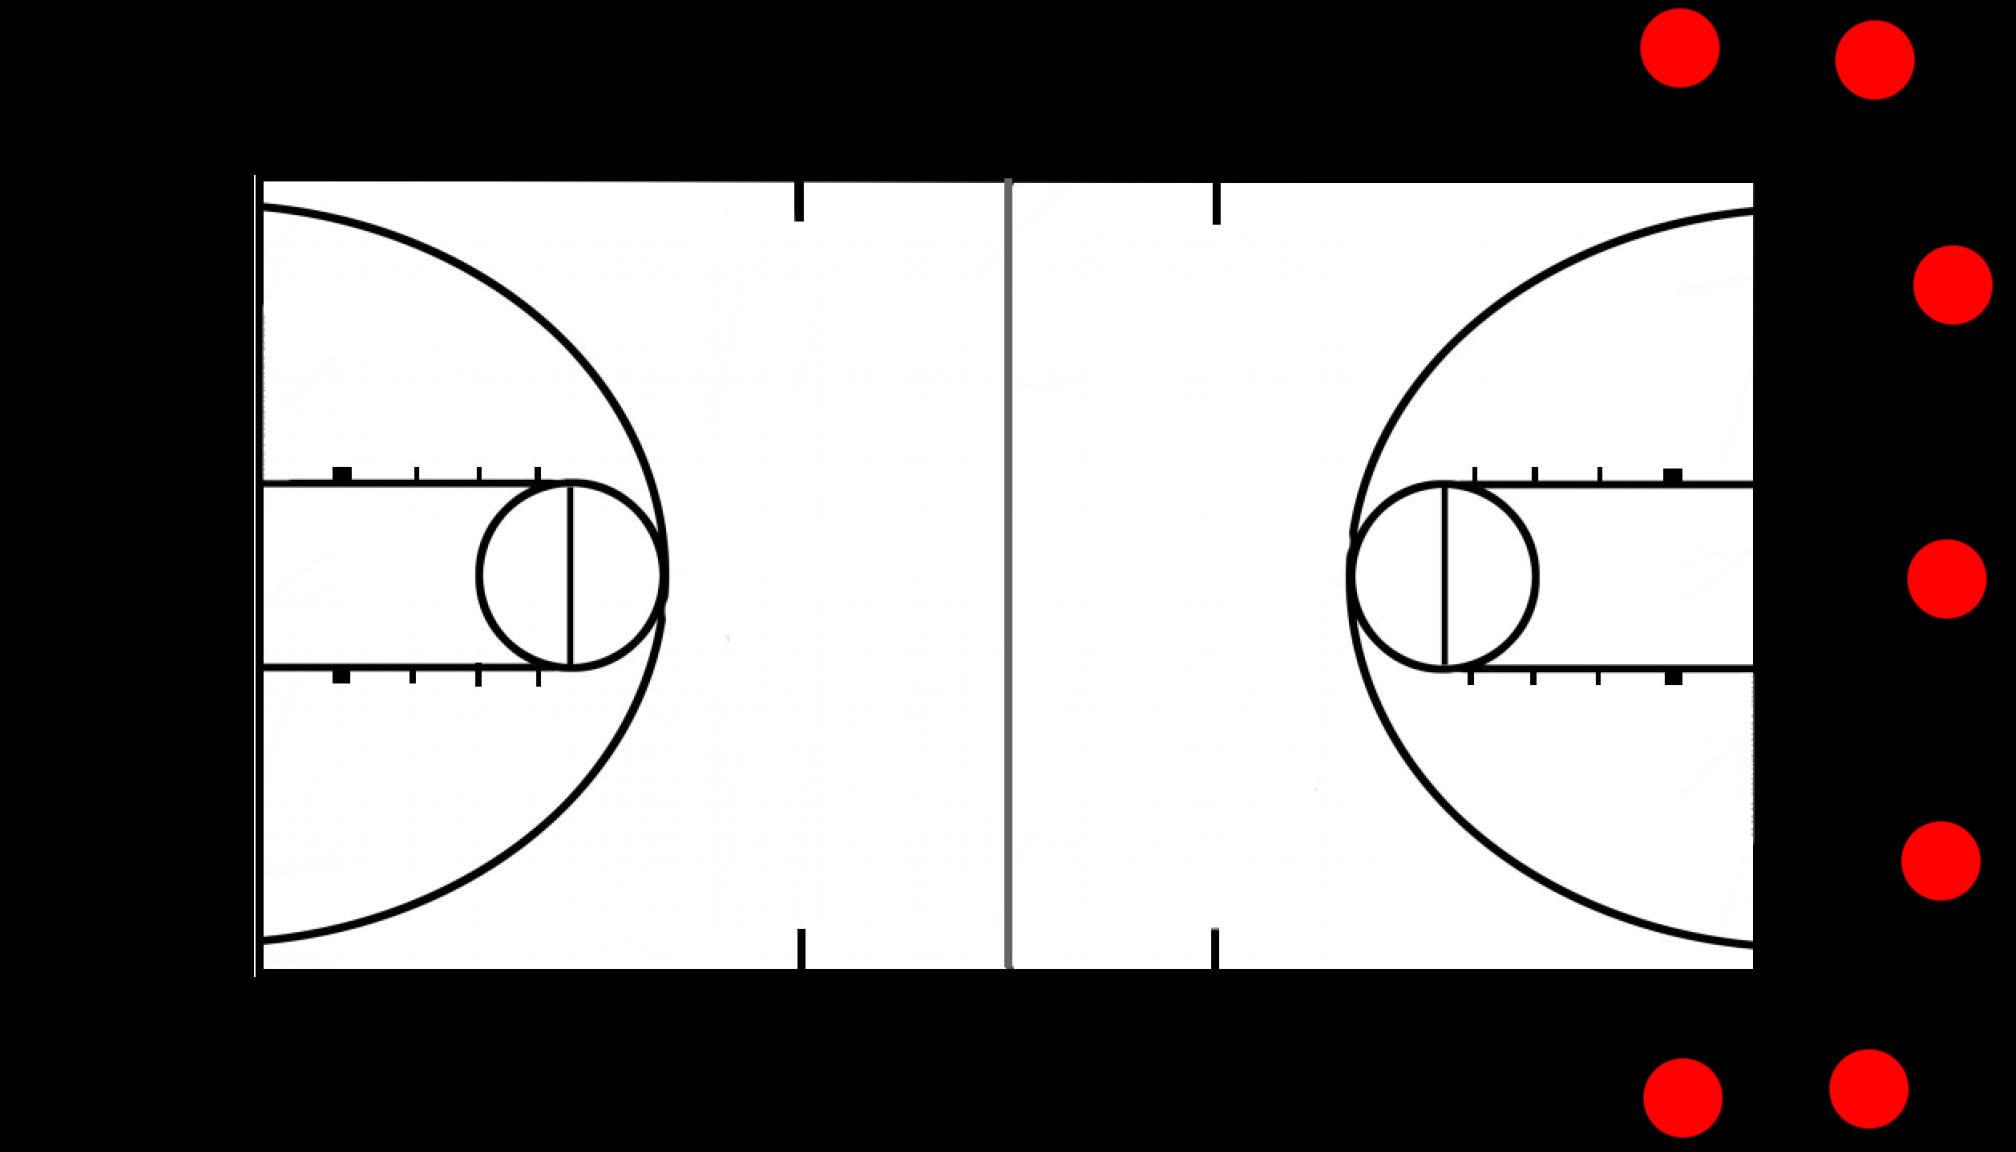 a basketball court diagram a free engine image for user manual download. Black Bedroom Furniture Sets. Home Design Ideas